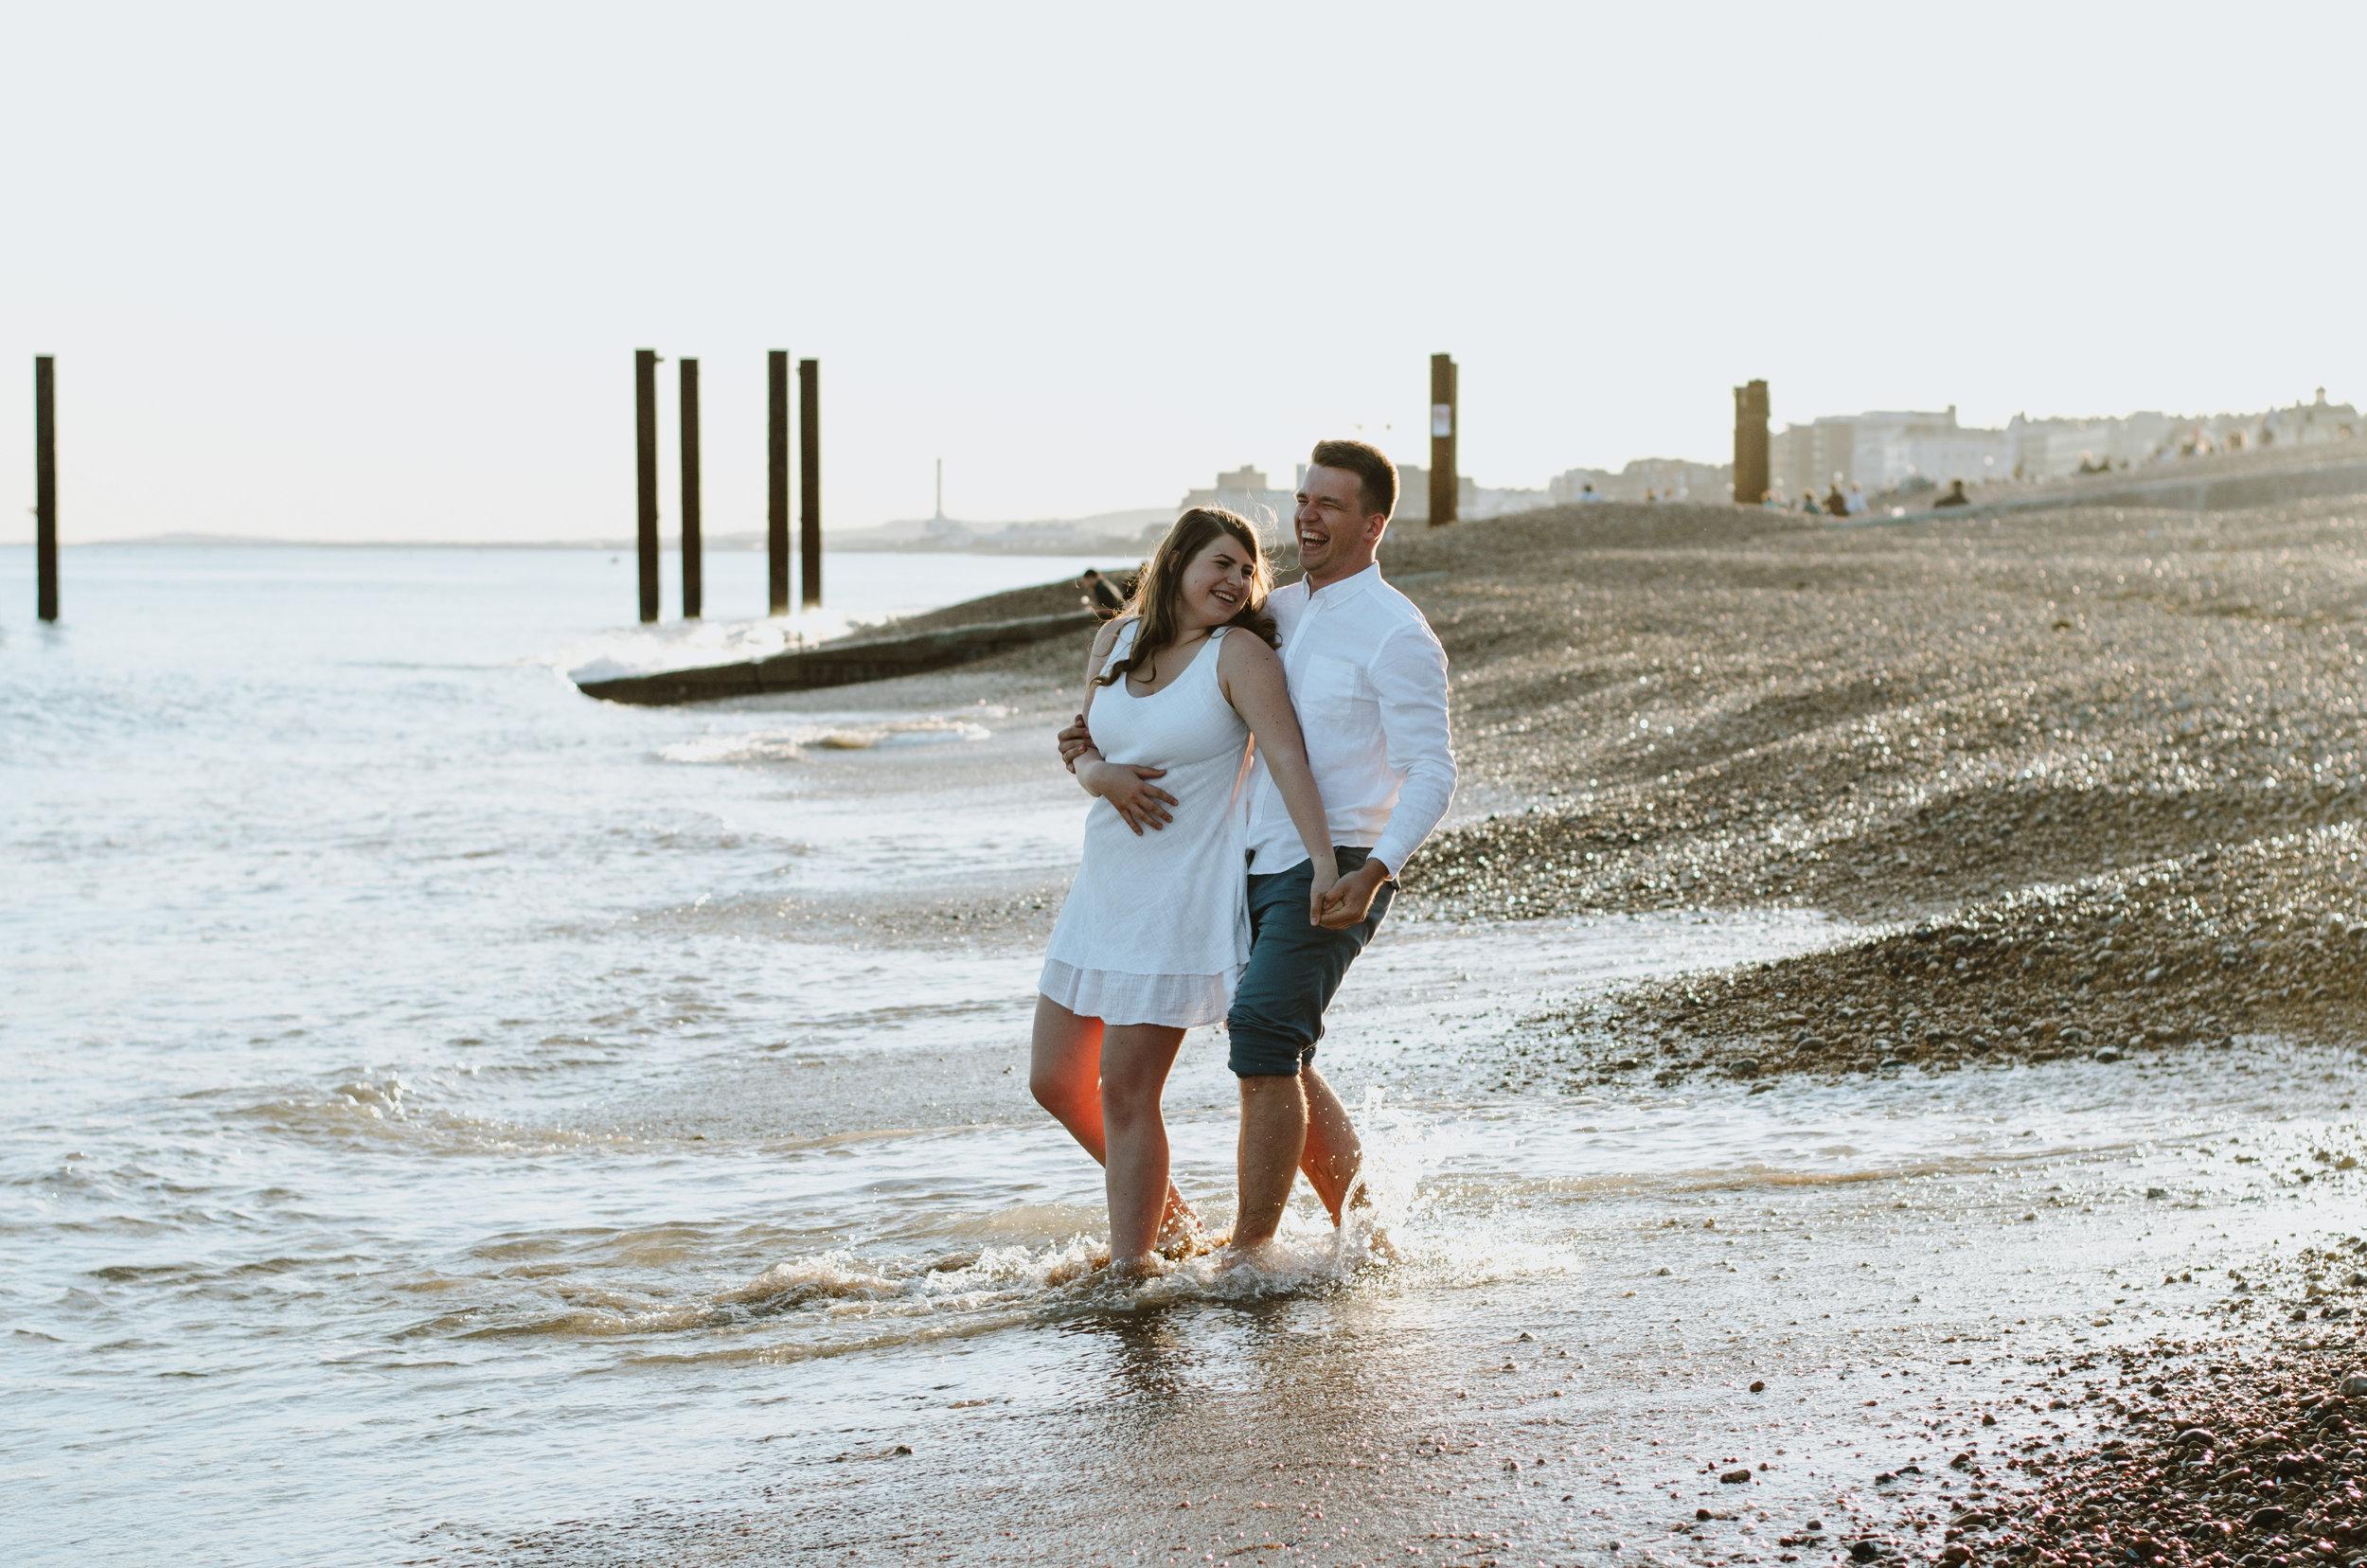 Ieva & Julius - Brighton Beach - Couple Session - Aiste Saulyte Photography-15.jpg